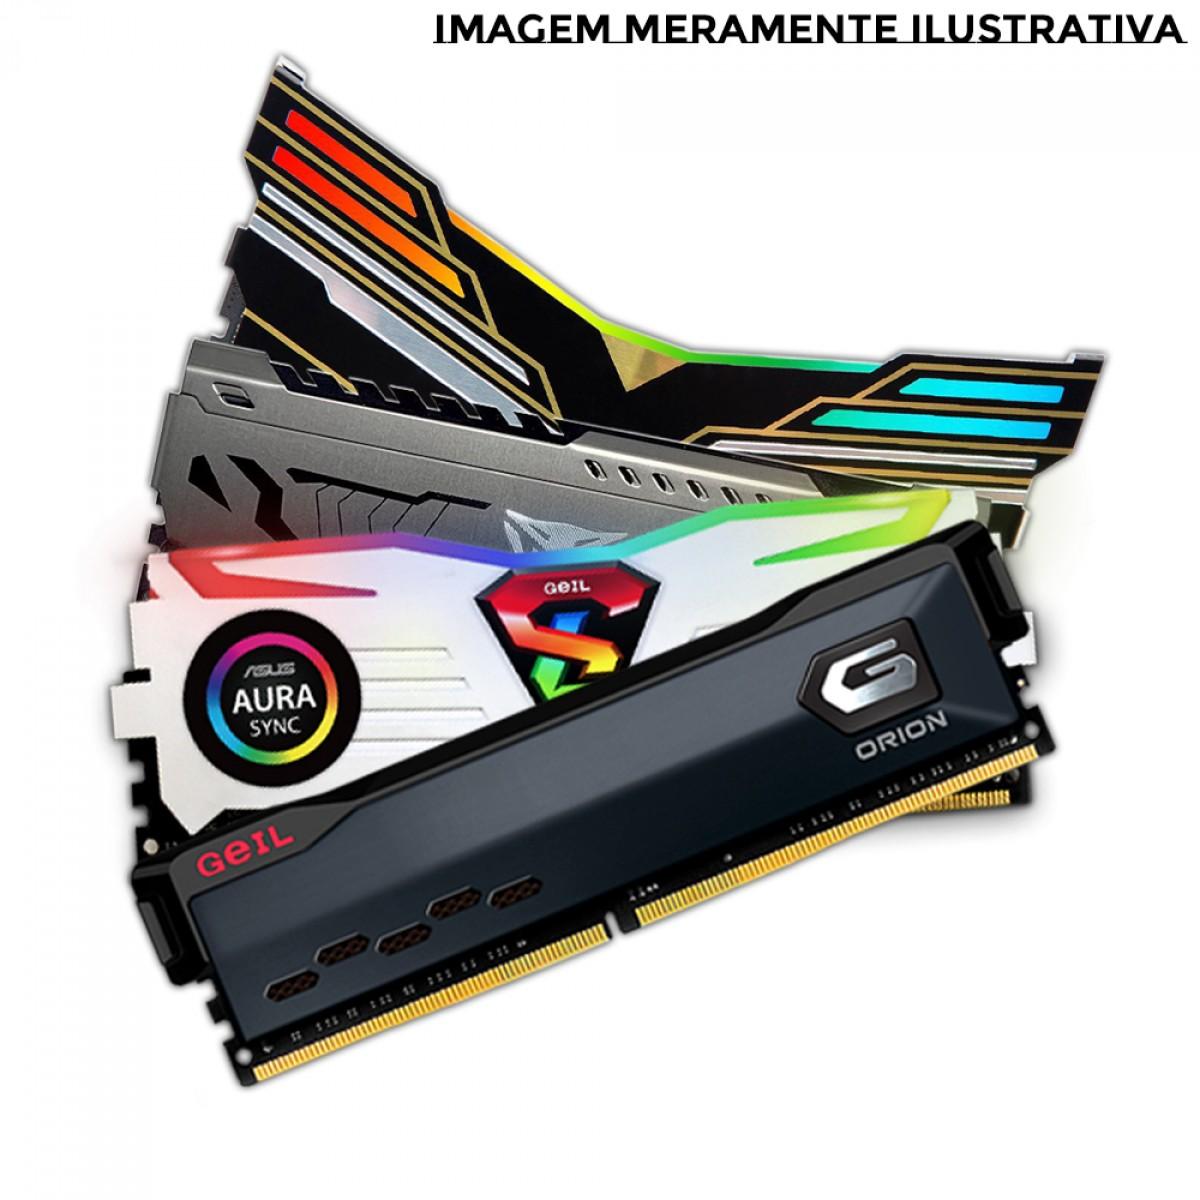 Kit Upgrade, AMD Ryzen 3 PRO 4350G + GIGABYTE B450M GAMING + Memória DDR4 16GB (2x8GB) 3000MHz